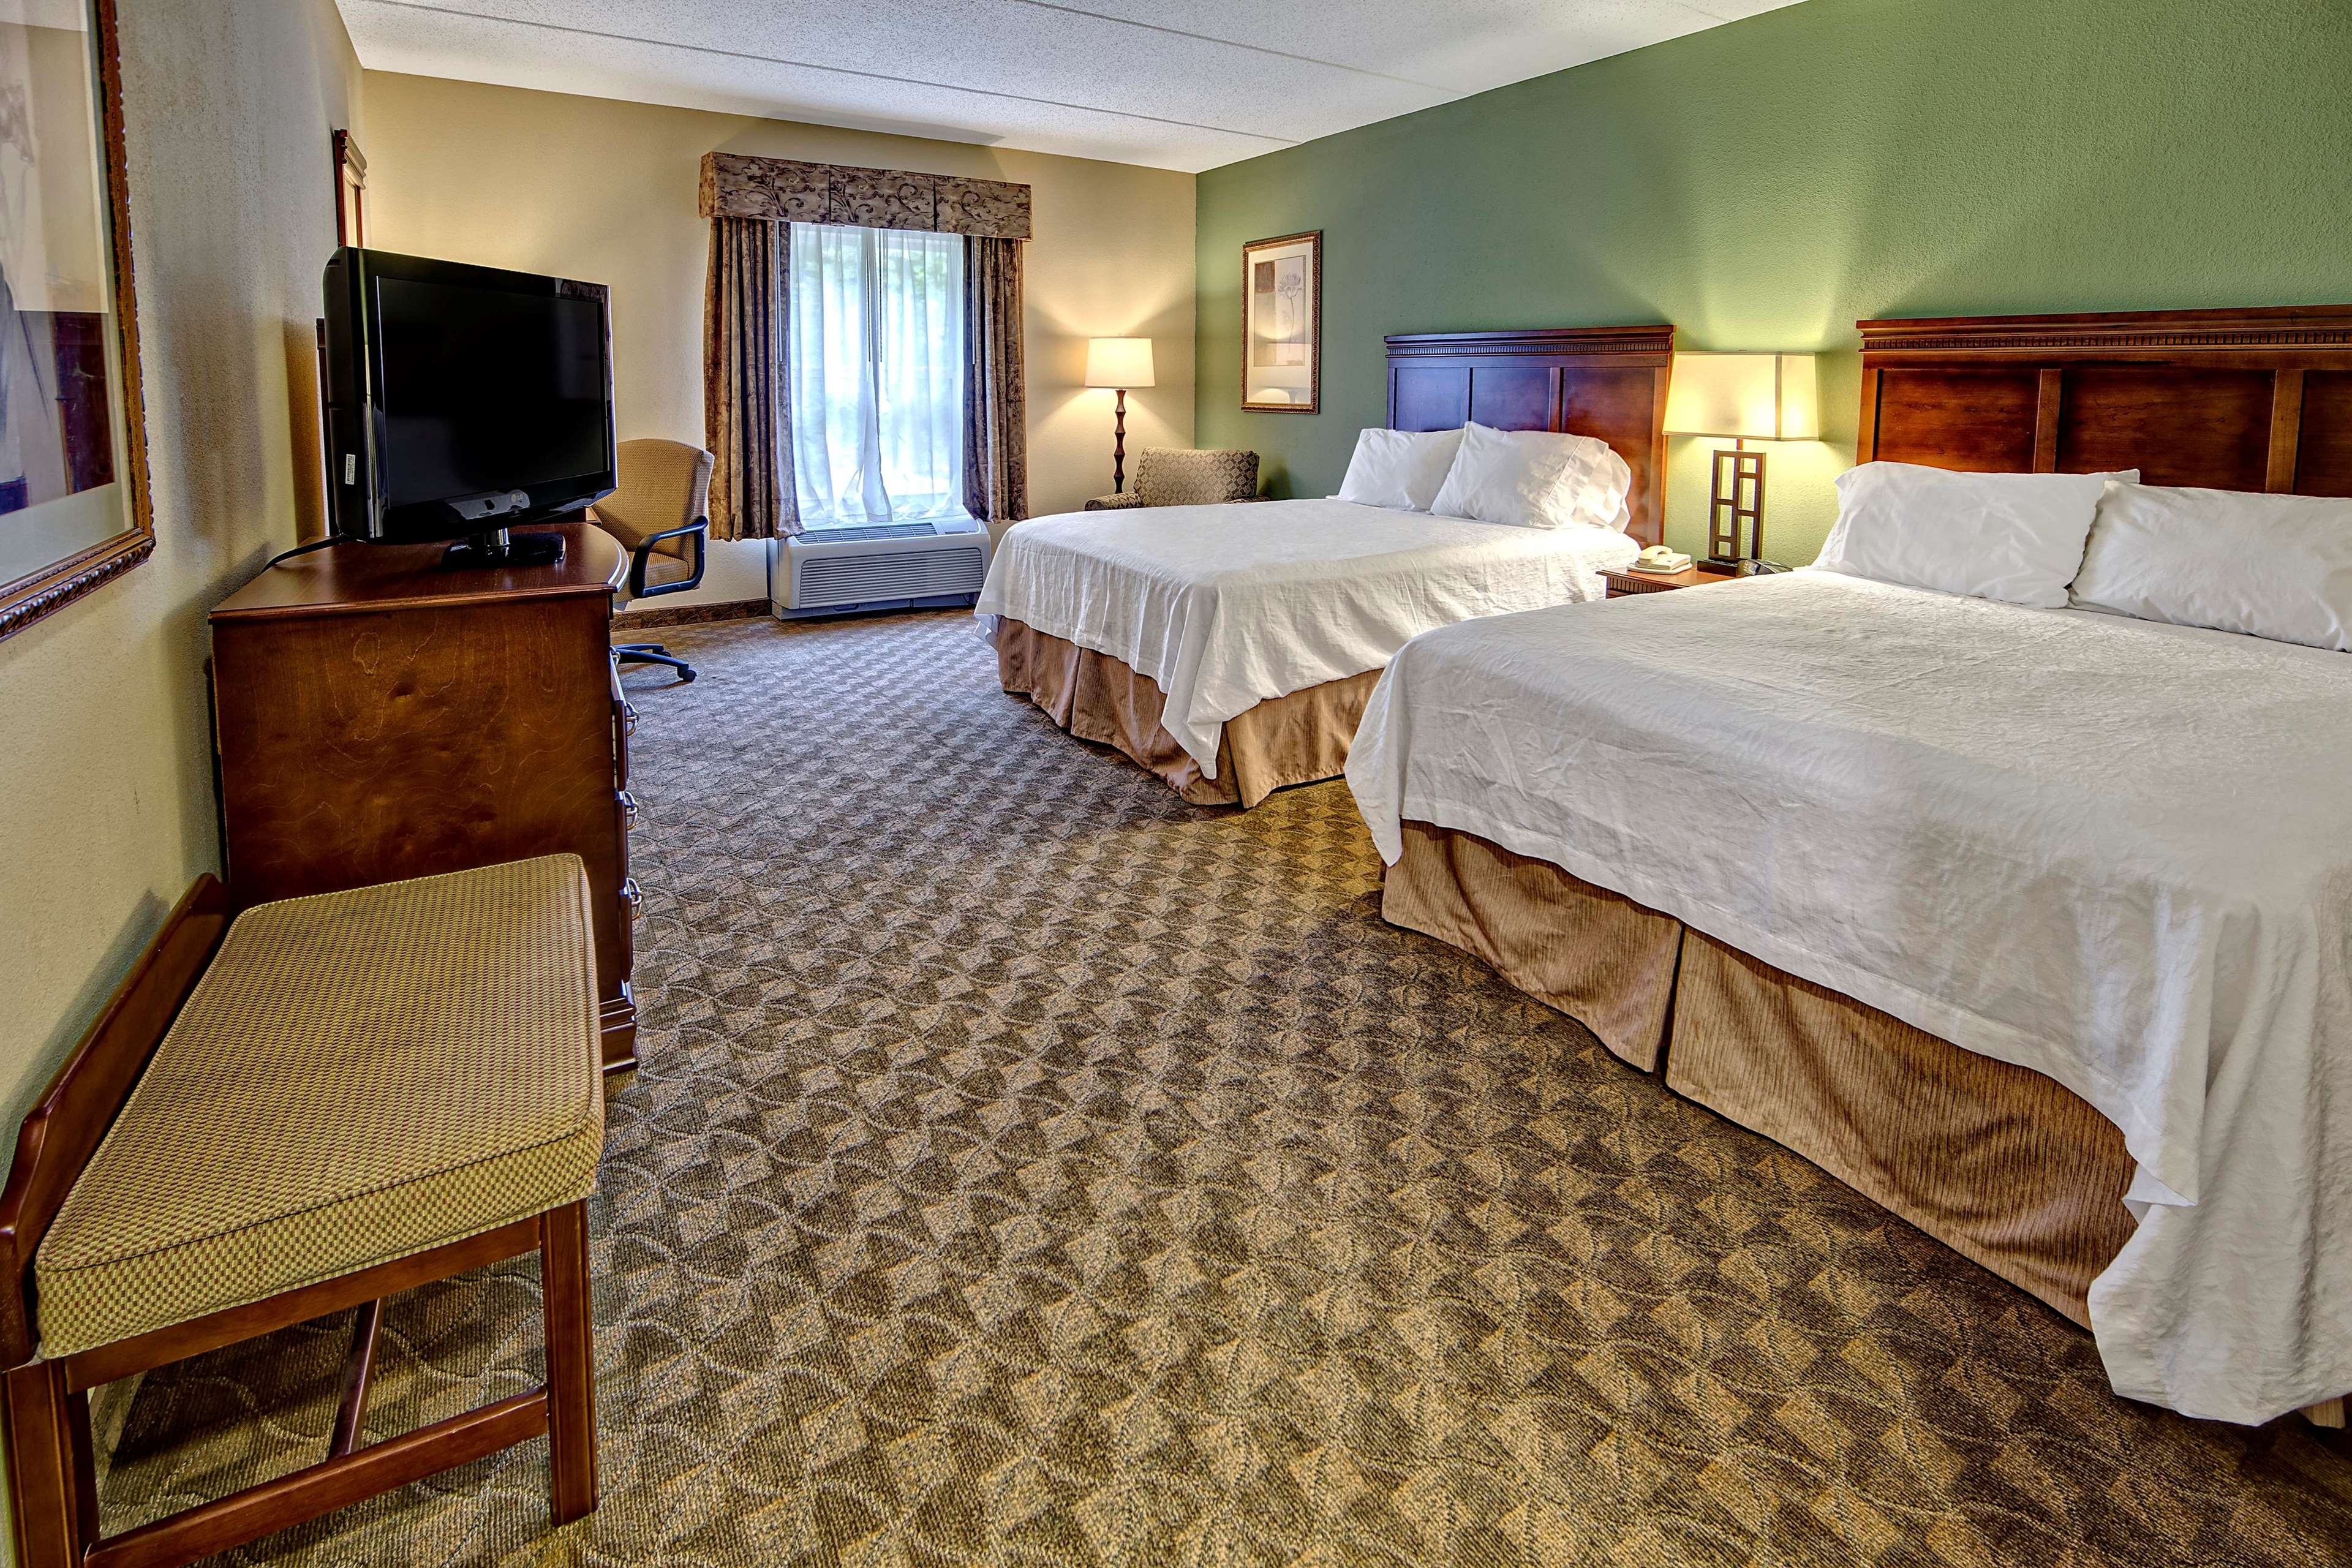 Hampton Inn & Suites Cashiers-Sapphire Valley image 37